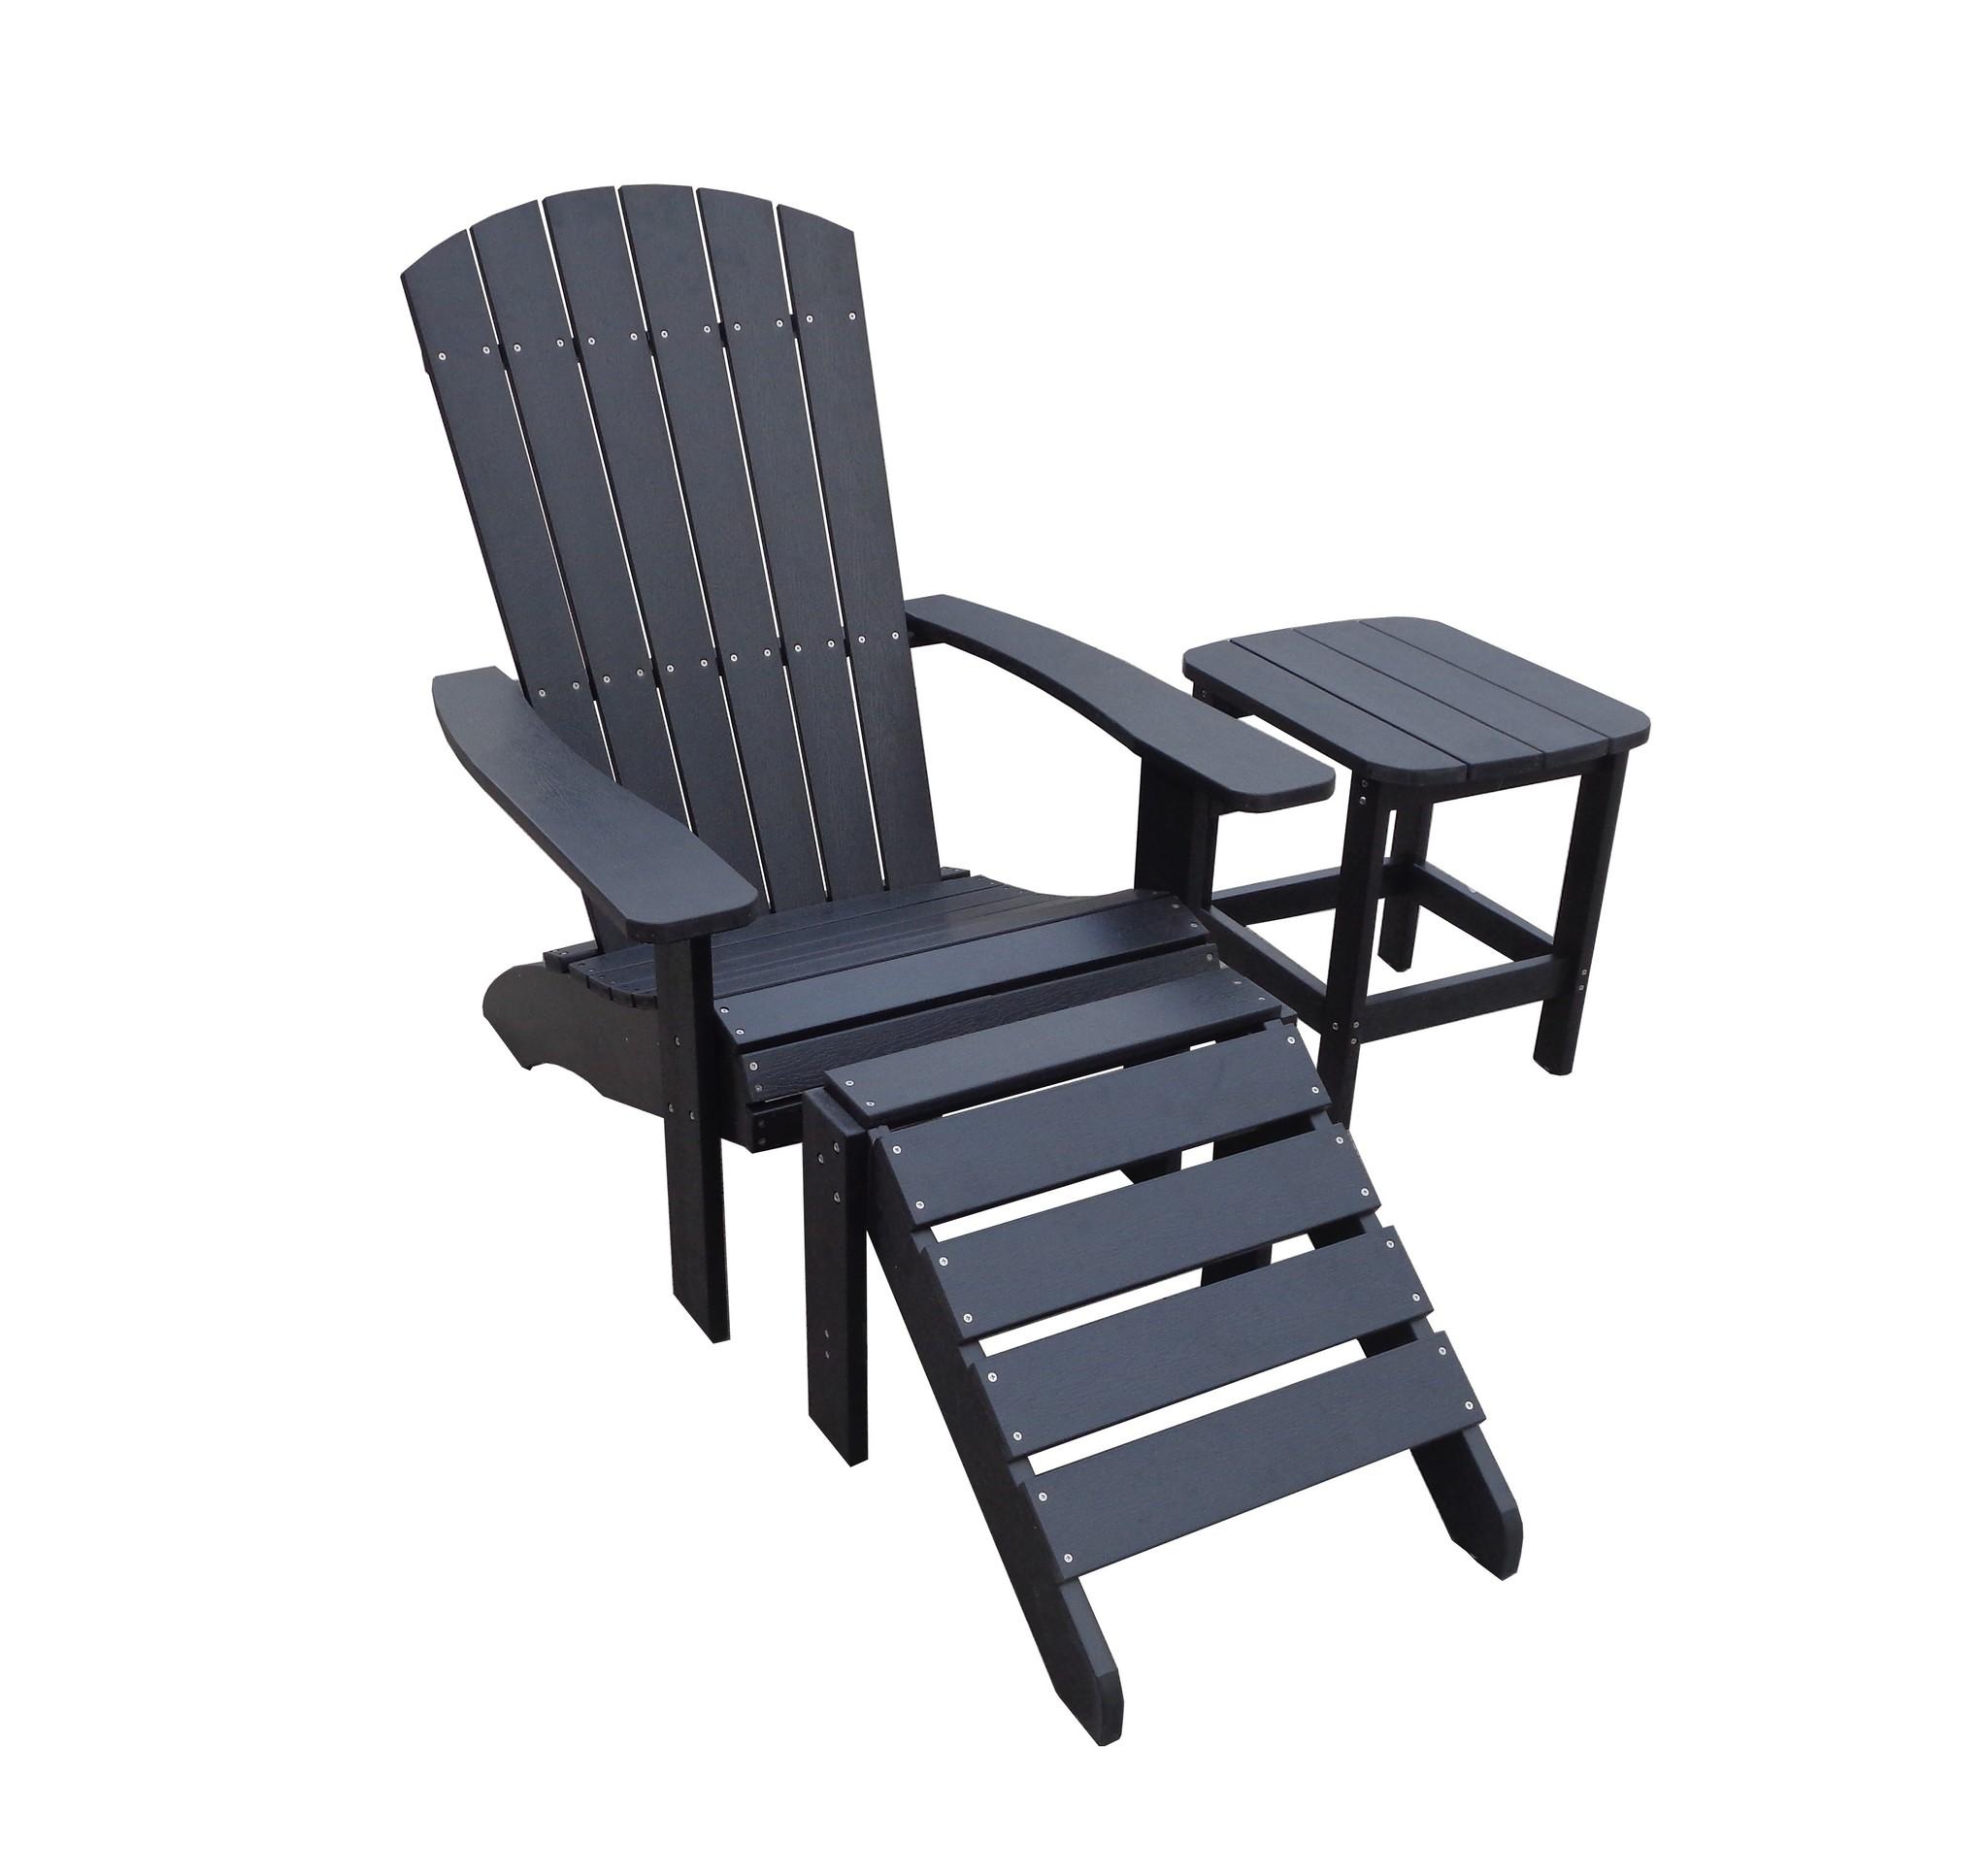 Adirondack Chair Kussens.Adirondack Set Kunststof Belize Black Garden Interiors